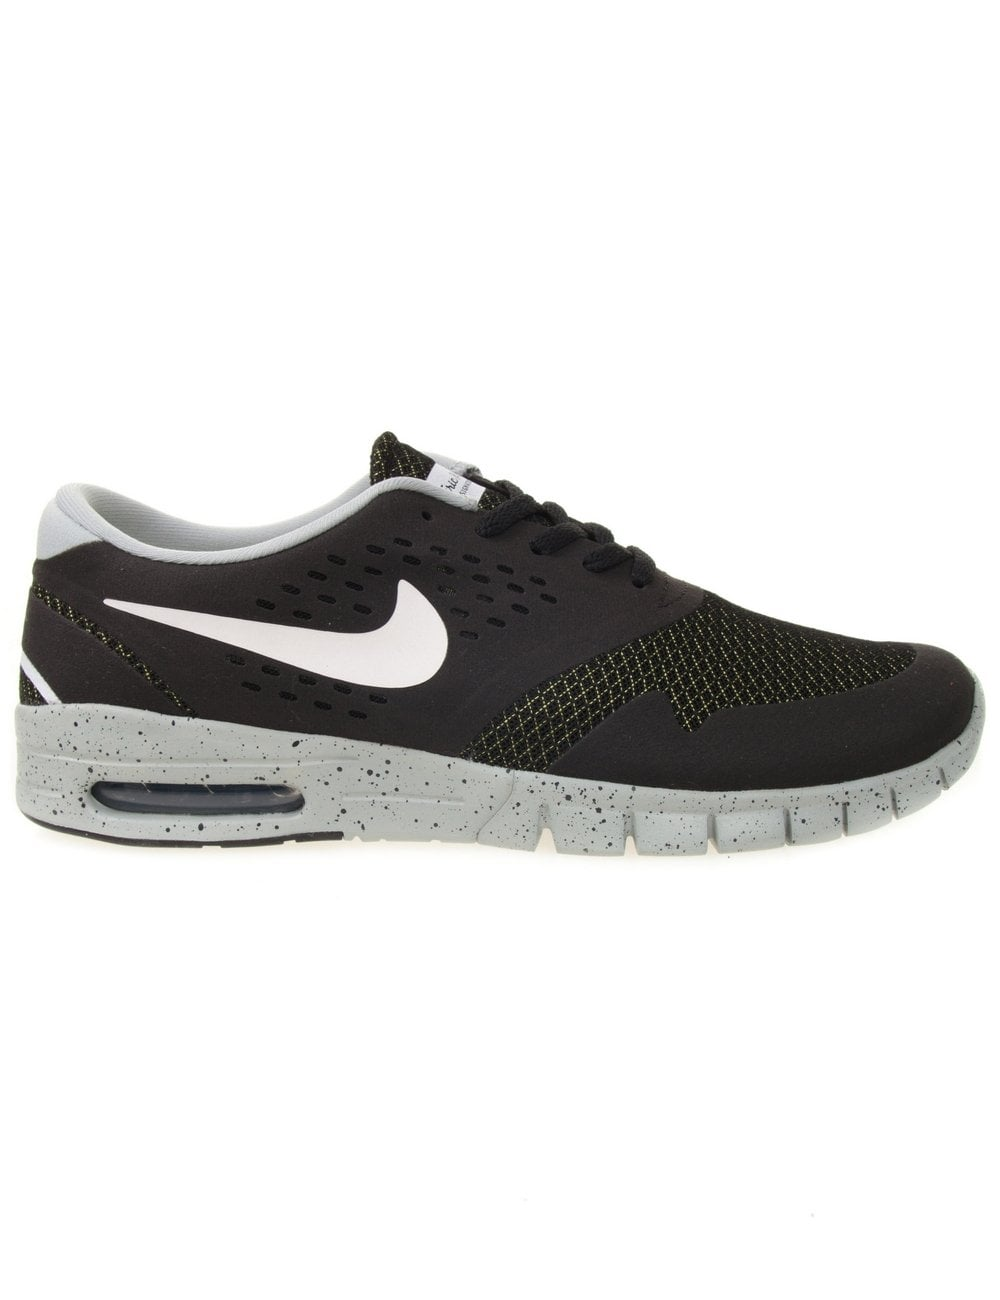 1672d7664130 Nike SB Eric Koston 2 Max - Black - Trainers from Fat Buddha Store UK